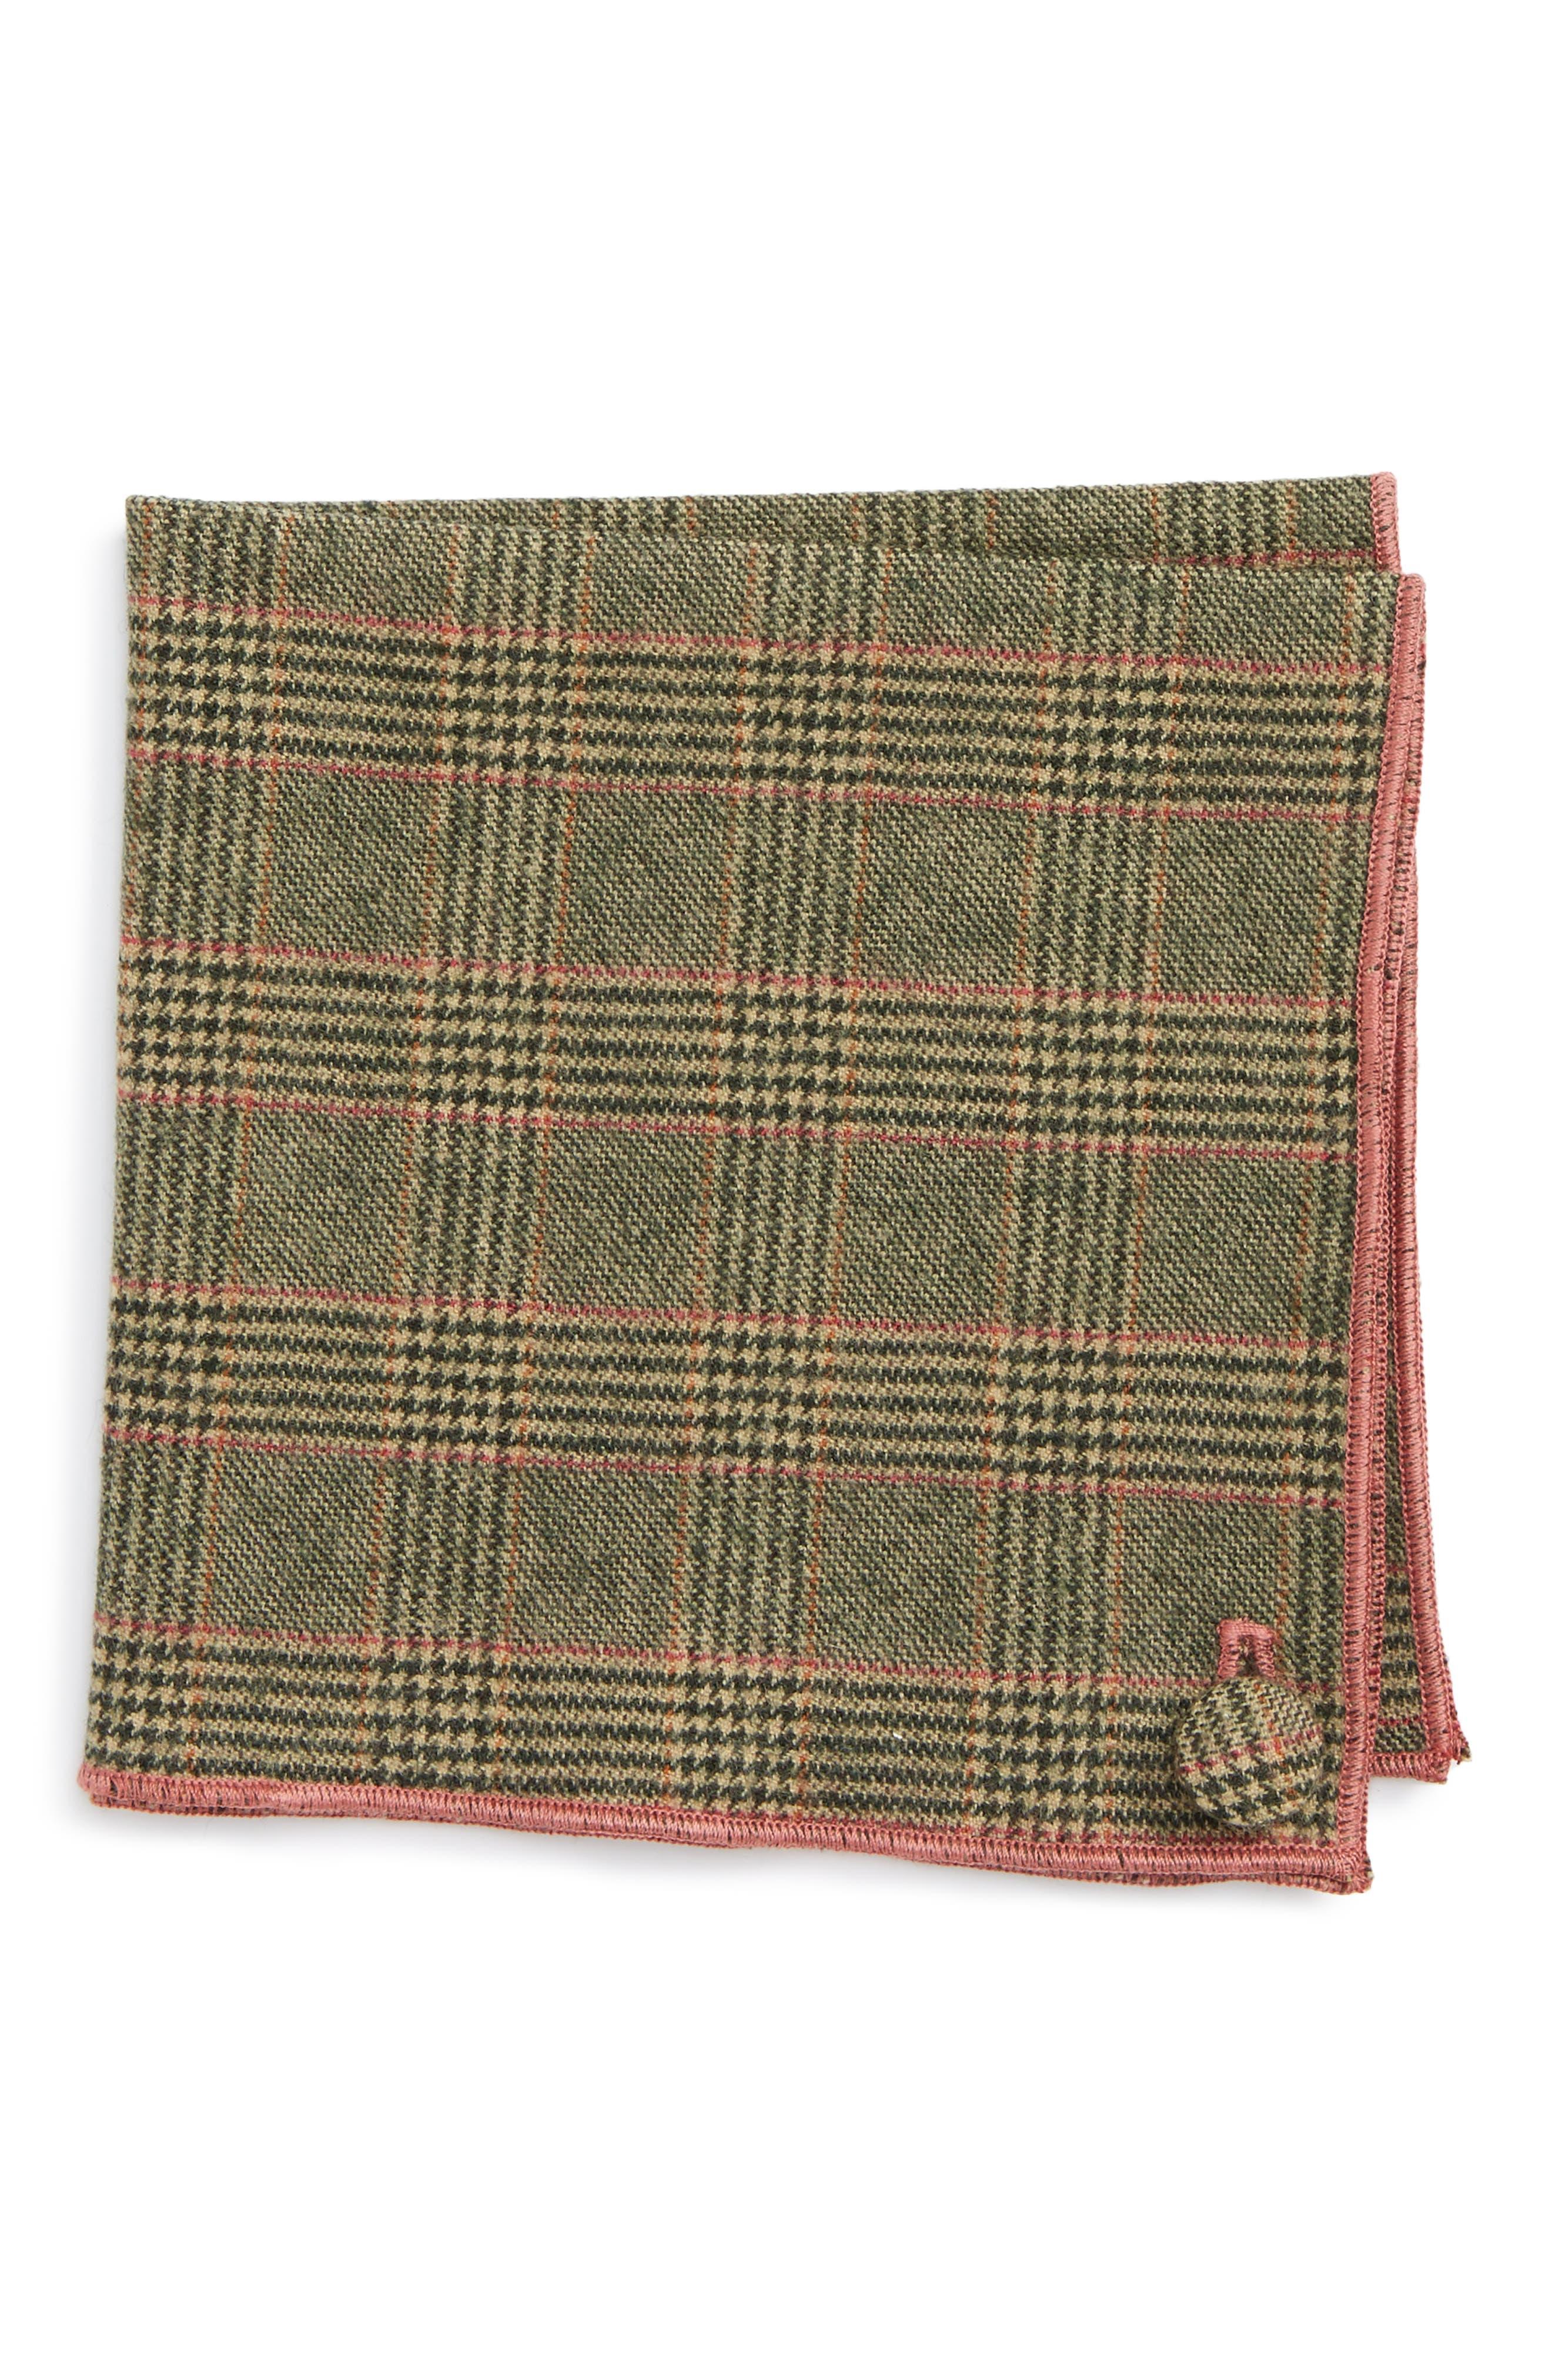 Goblin Wool Pocket Square,                         Main,                         color, 250